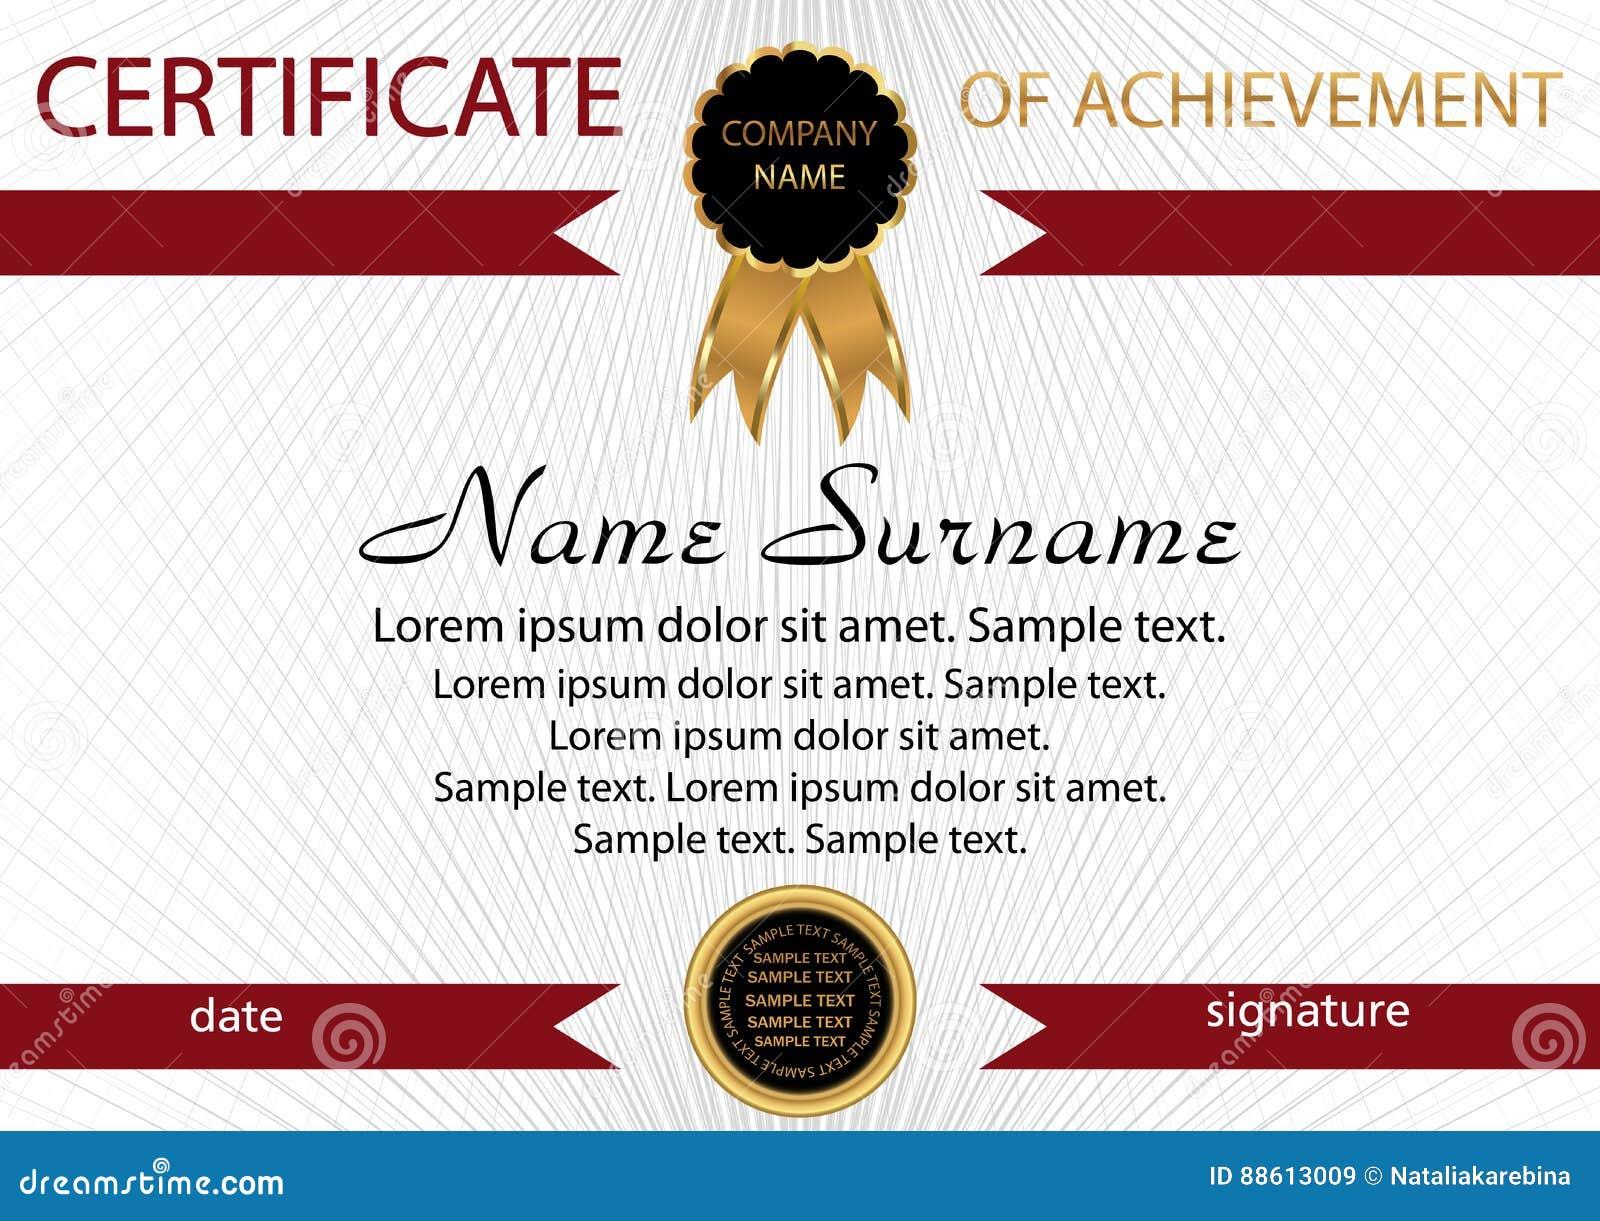 Template Certificate Of Achievement Elegant Background Winning